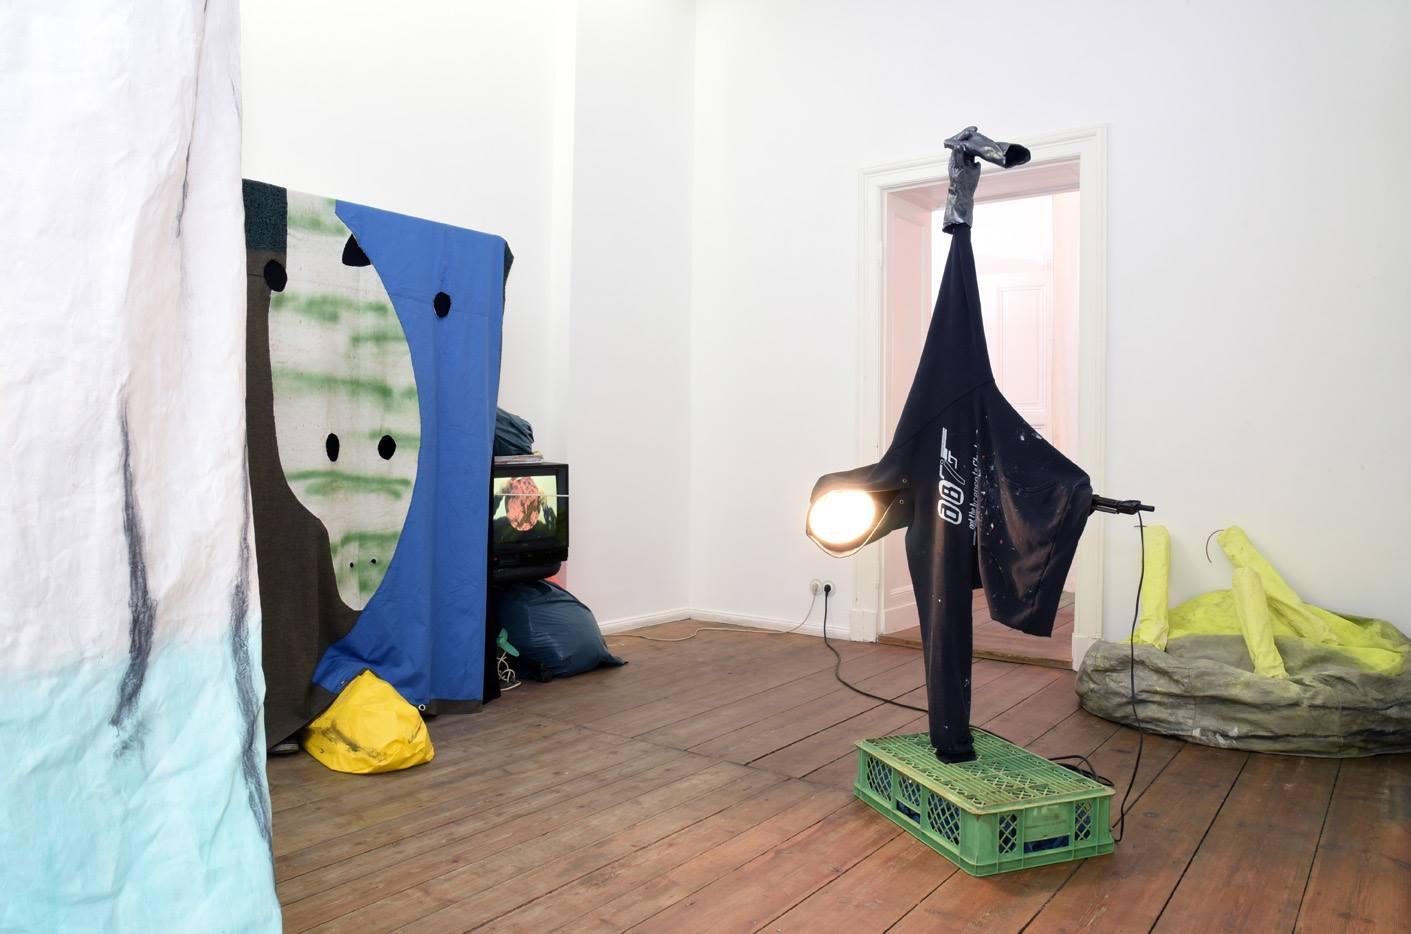 Ulrika Segerberg, Trust Me Not, 2016, installation view at Grimmuseum (5)